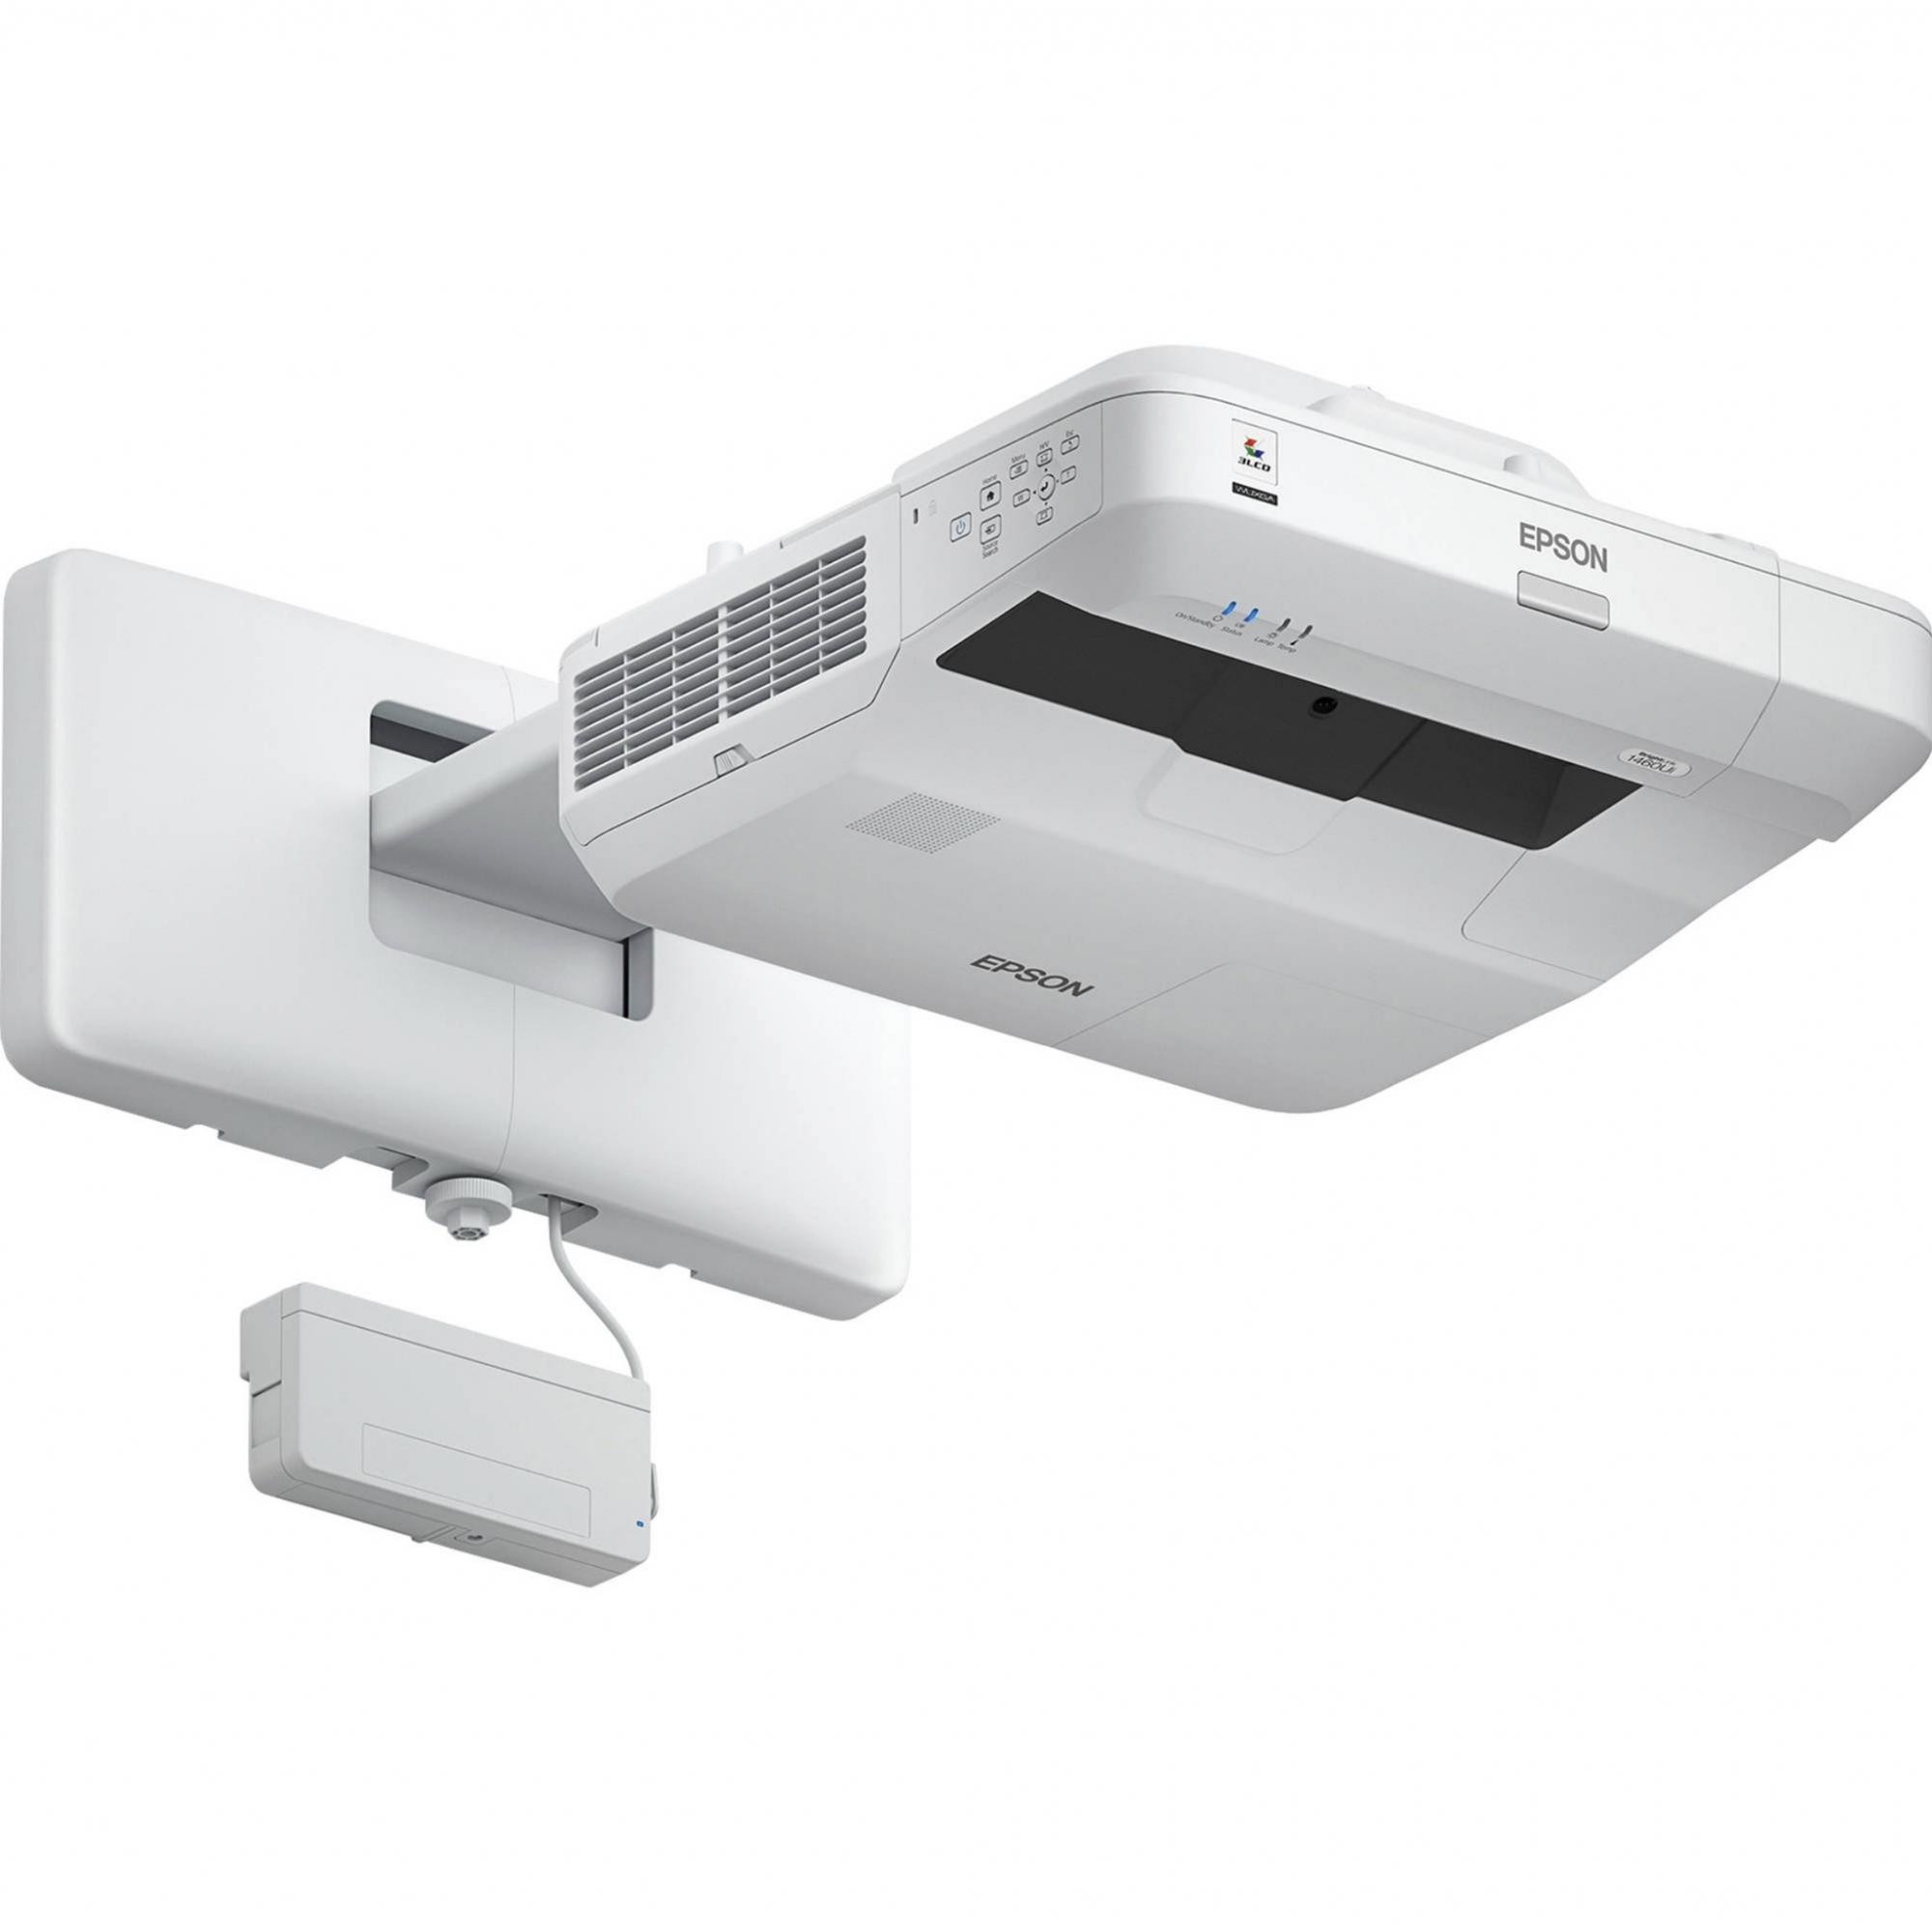 Projetor interativo Epson BrightLink Pro 1460Ui Full HD 4400LM Sem Suporte